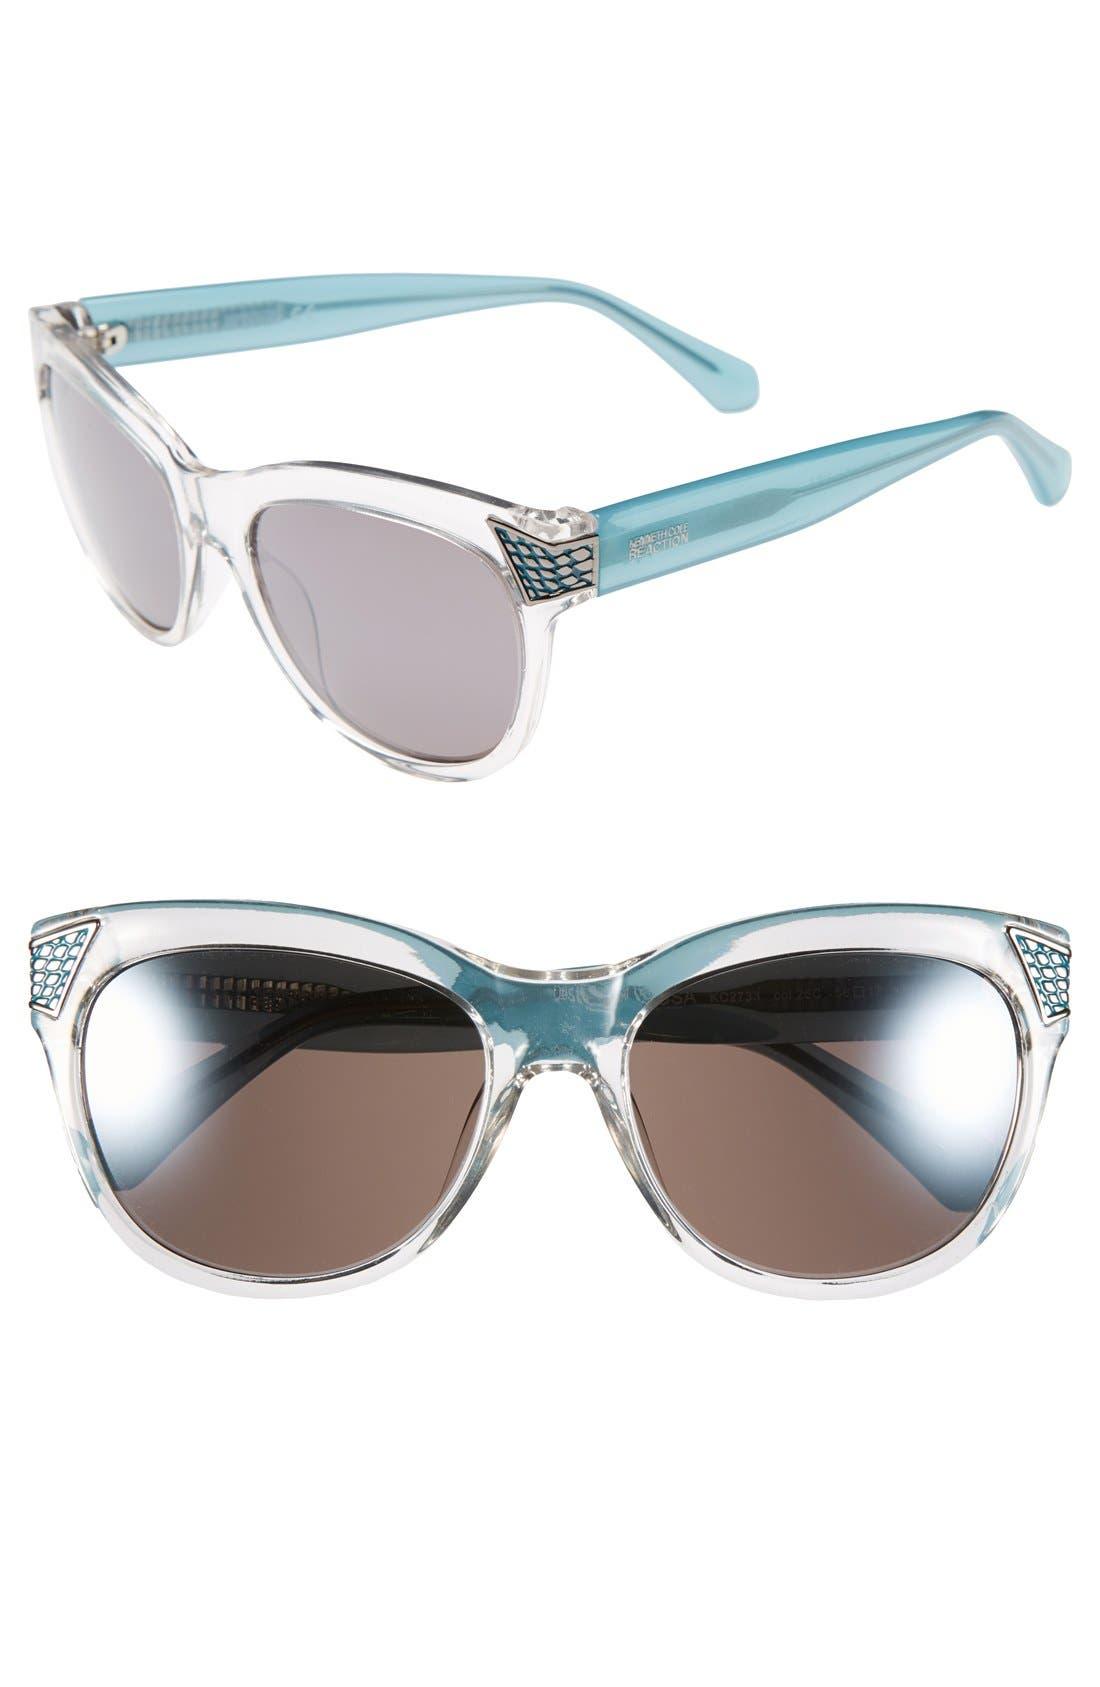 Main Image - Kenneth Cole Reaction 56mm Retro Sunglasses